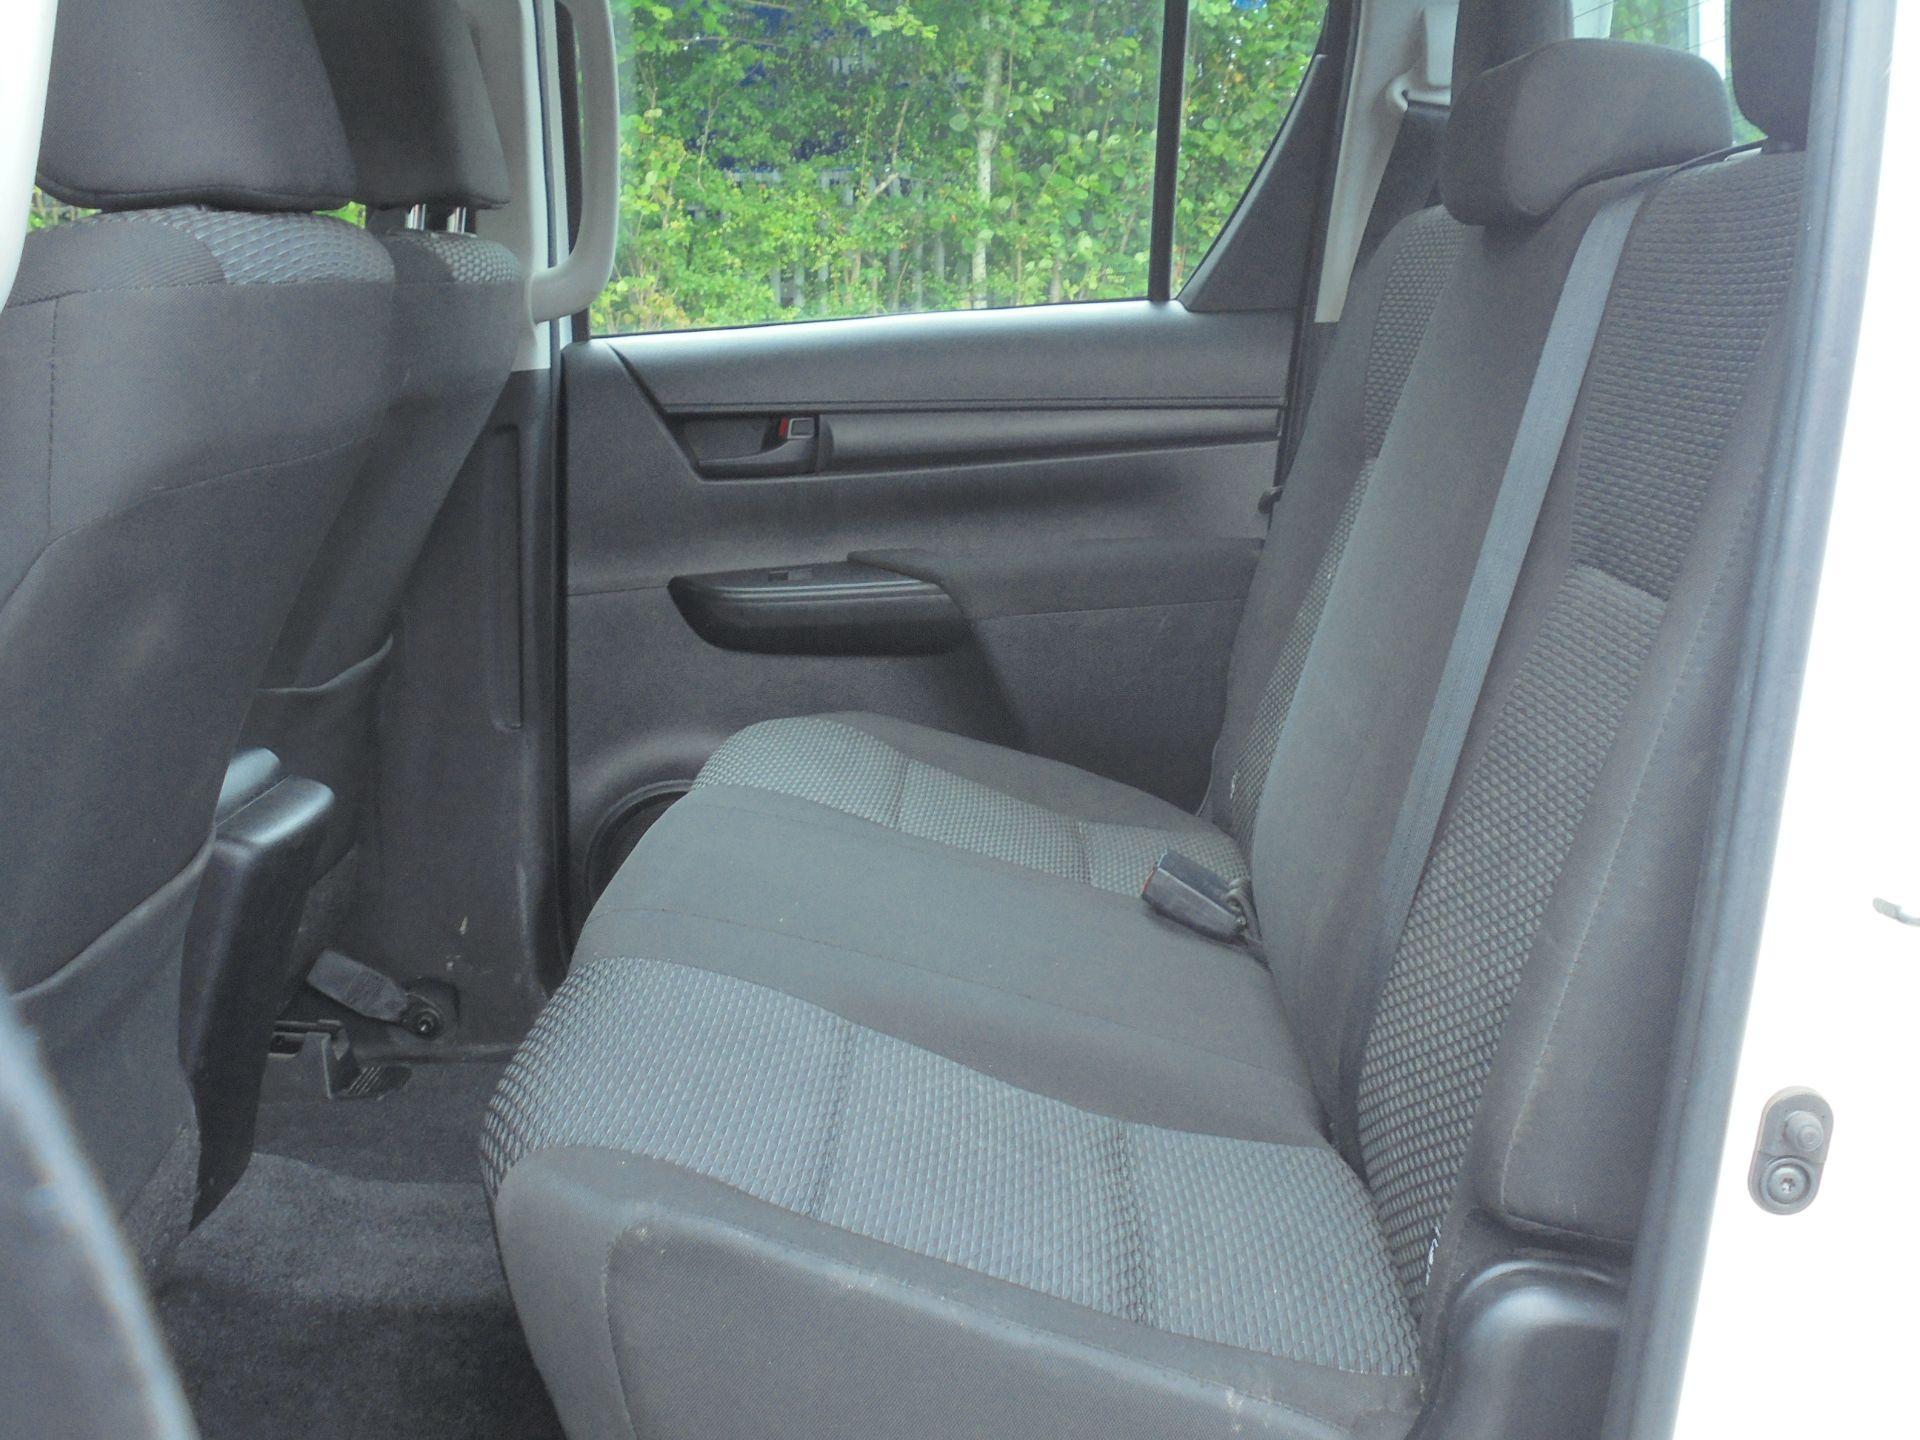 2018 Toyota Hilux Active D/Cab Pick Up 2.5 D-4D 4Wd 144 (NV18NTC) Image 6